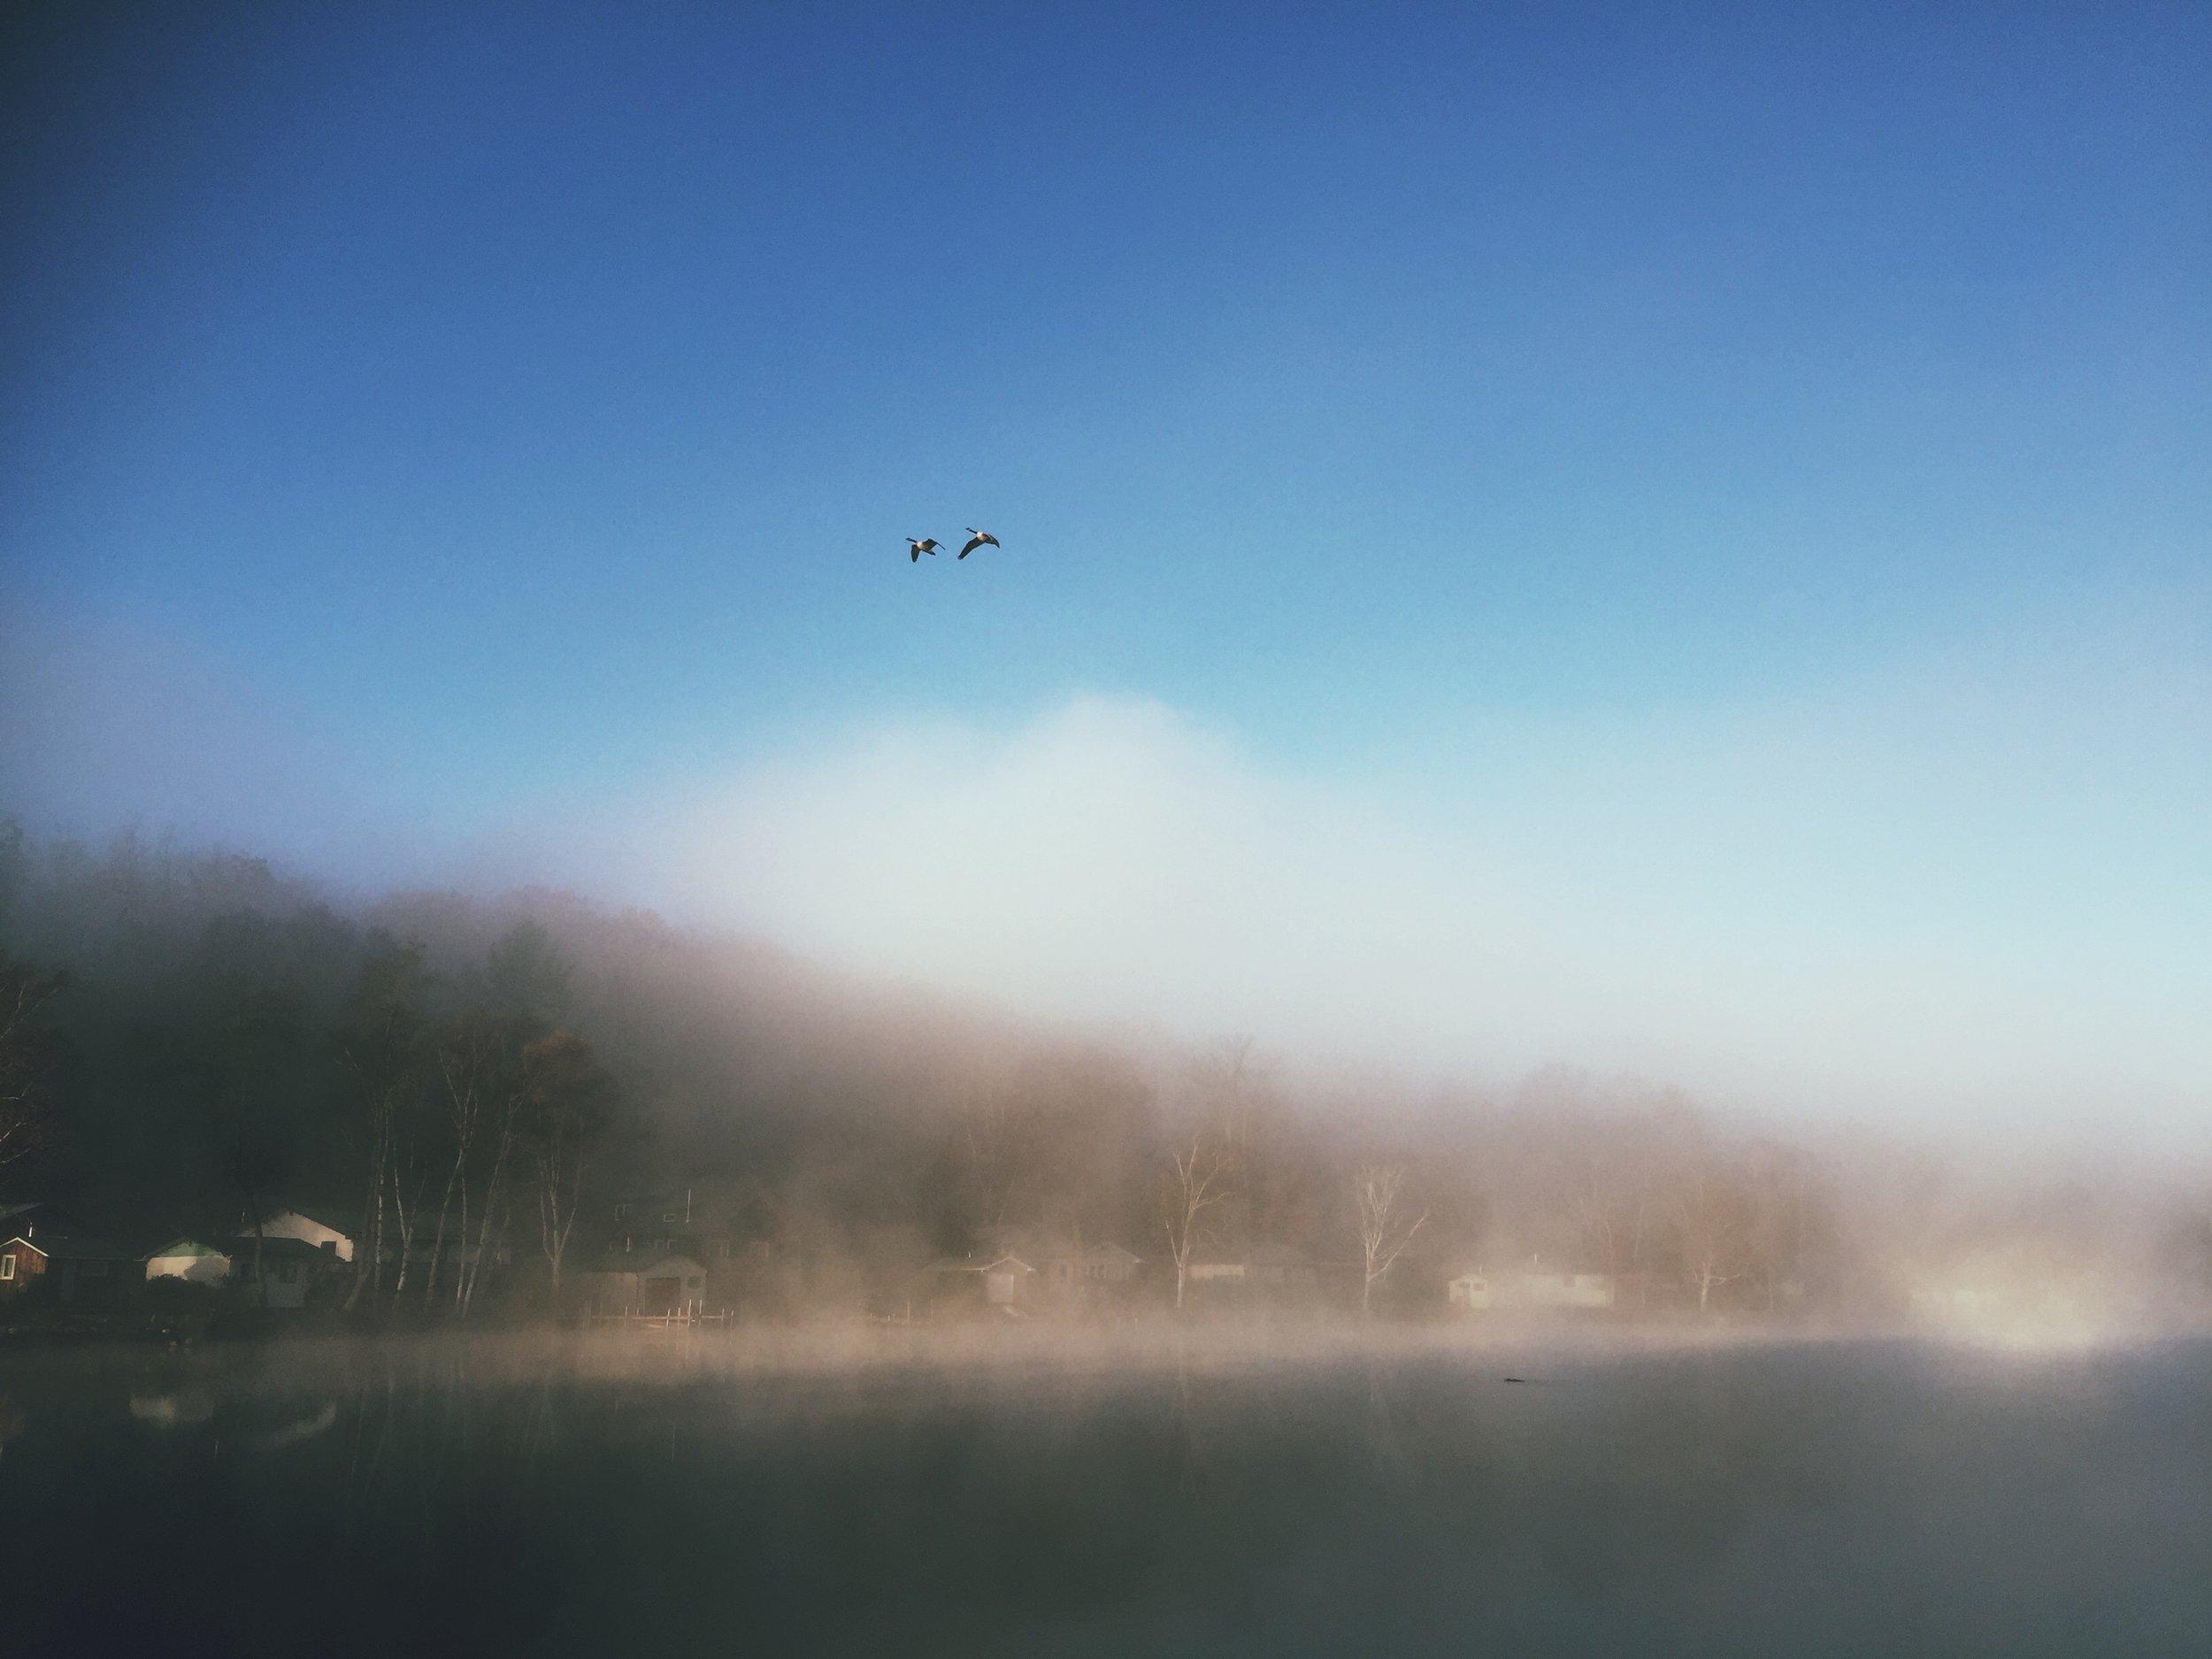 Gueese over river_morning mist.JPG